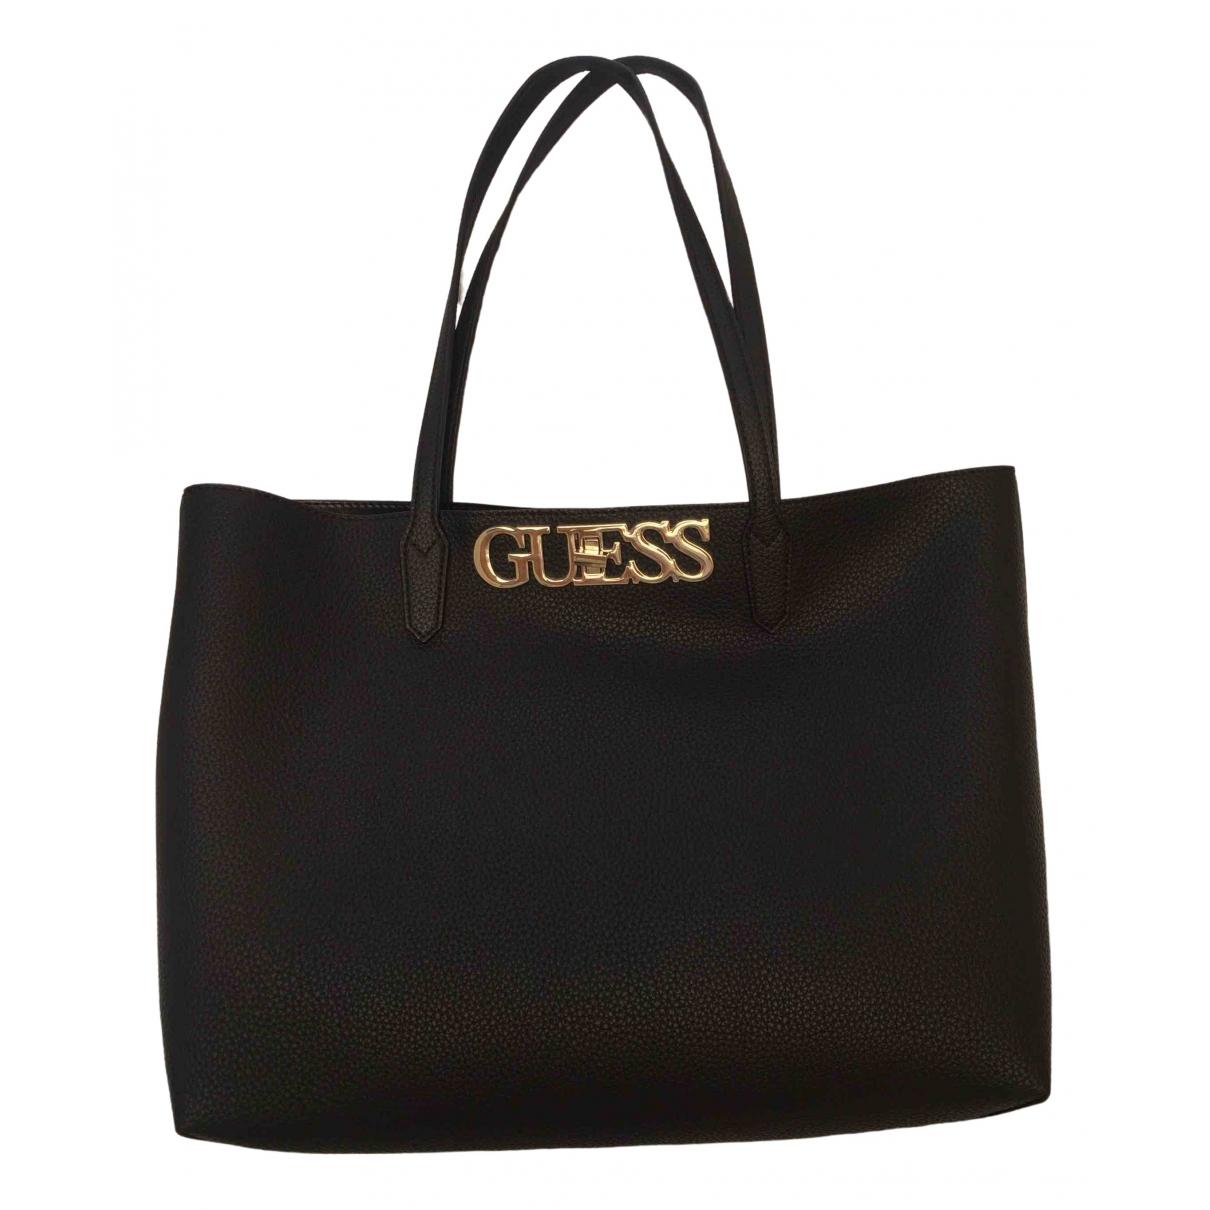 Guess \N Black Leather handbag for Women \N